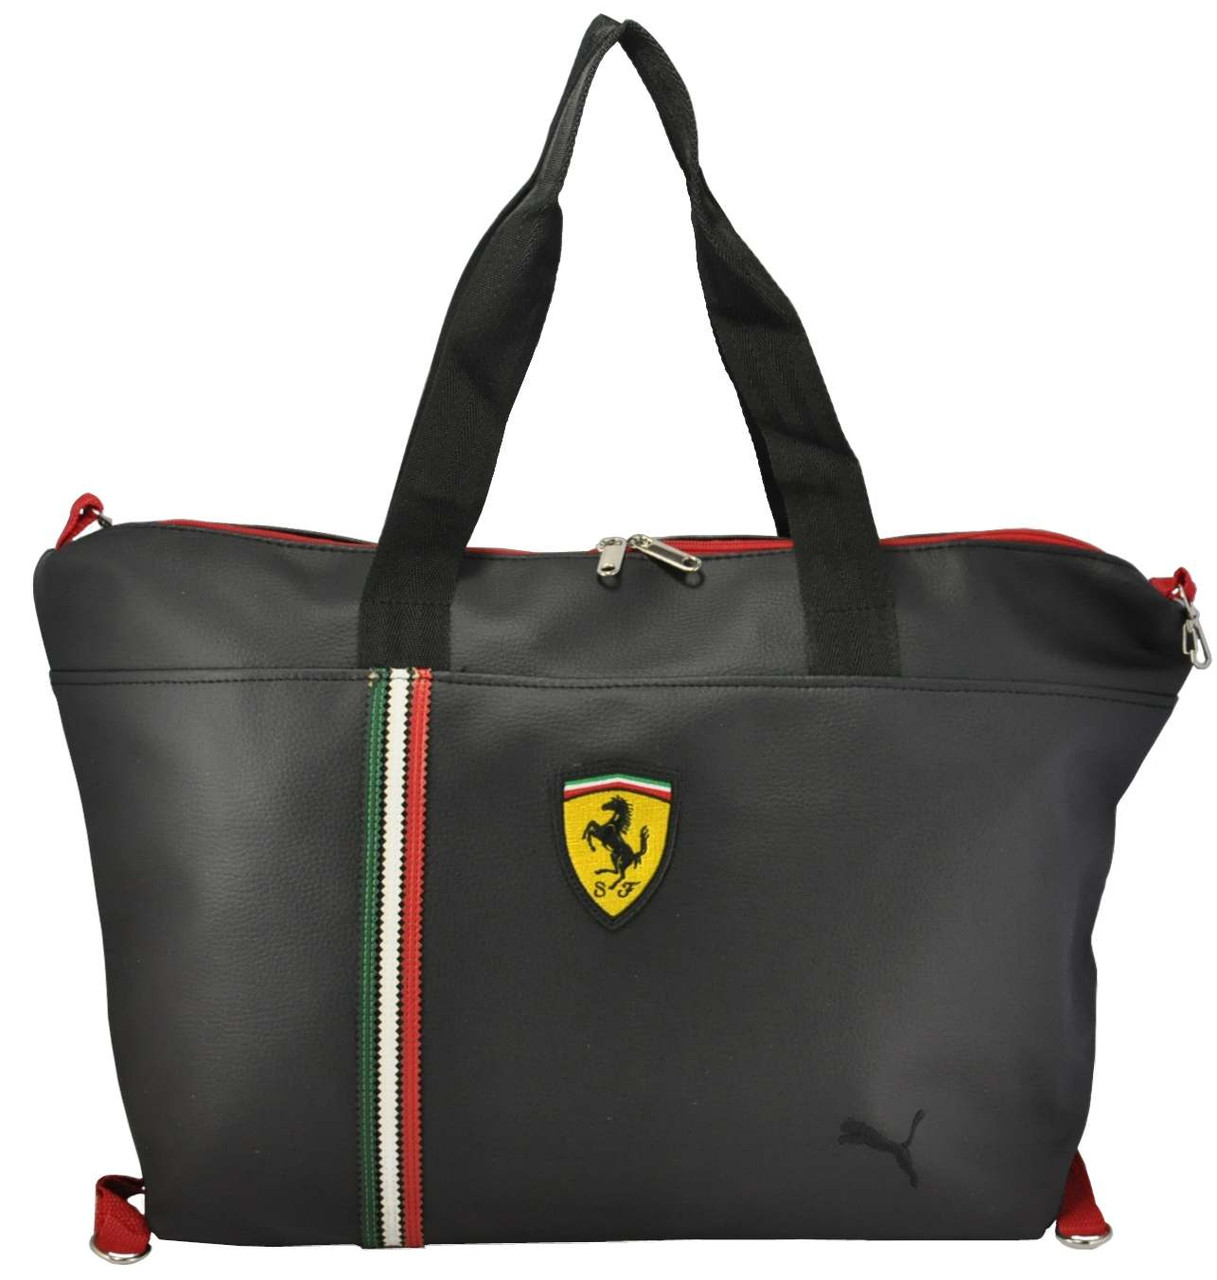 0c400876 Спортивная сумка Puma Ferrari черная реплика - Интернет магазин